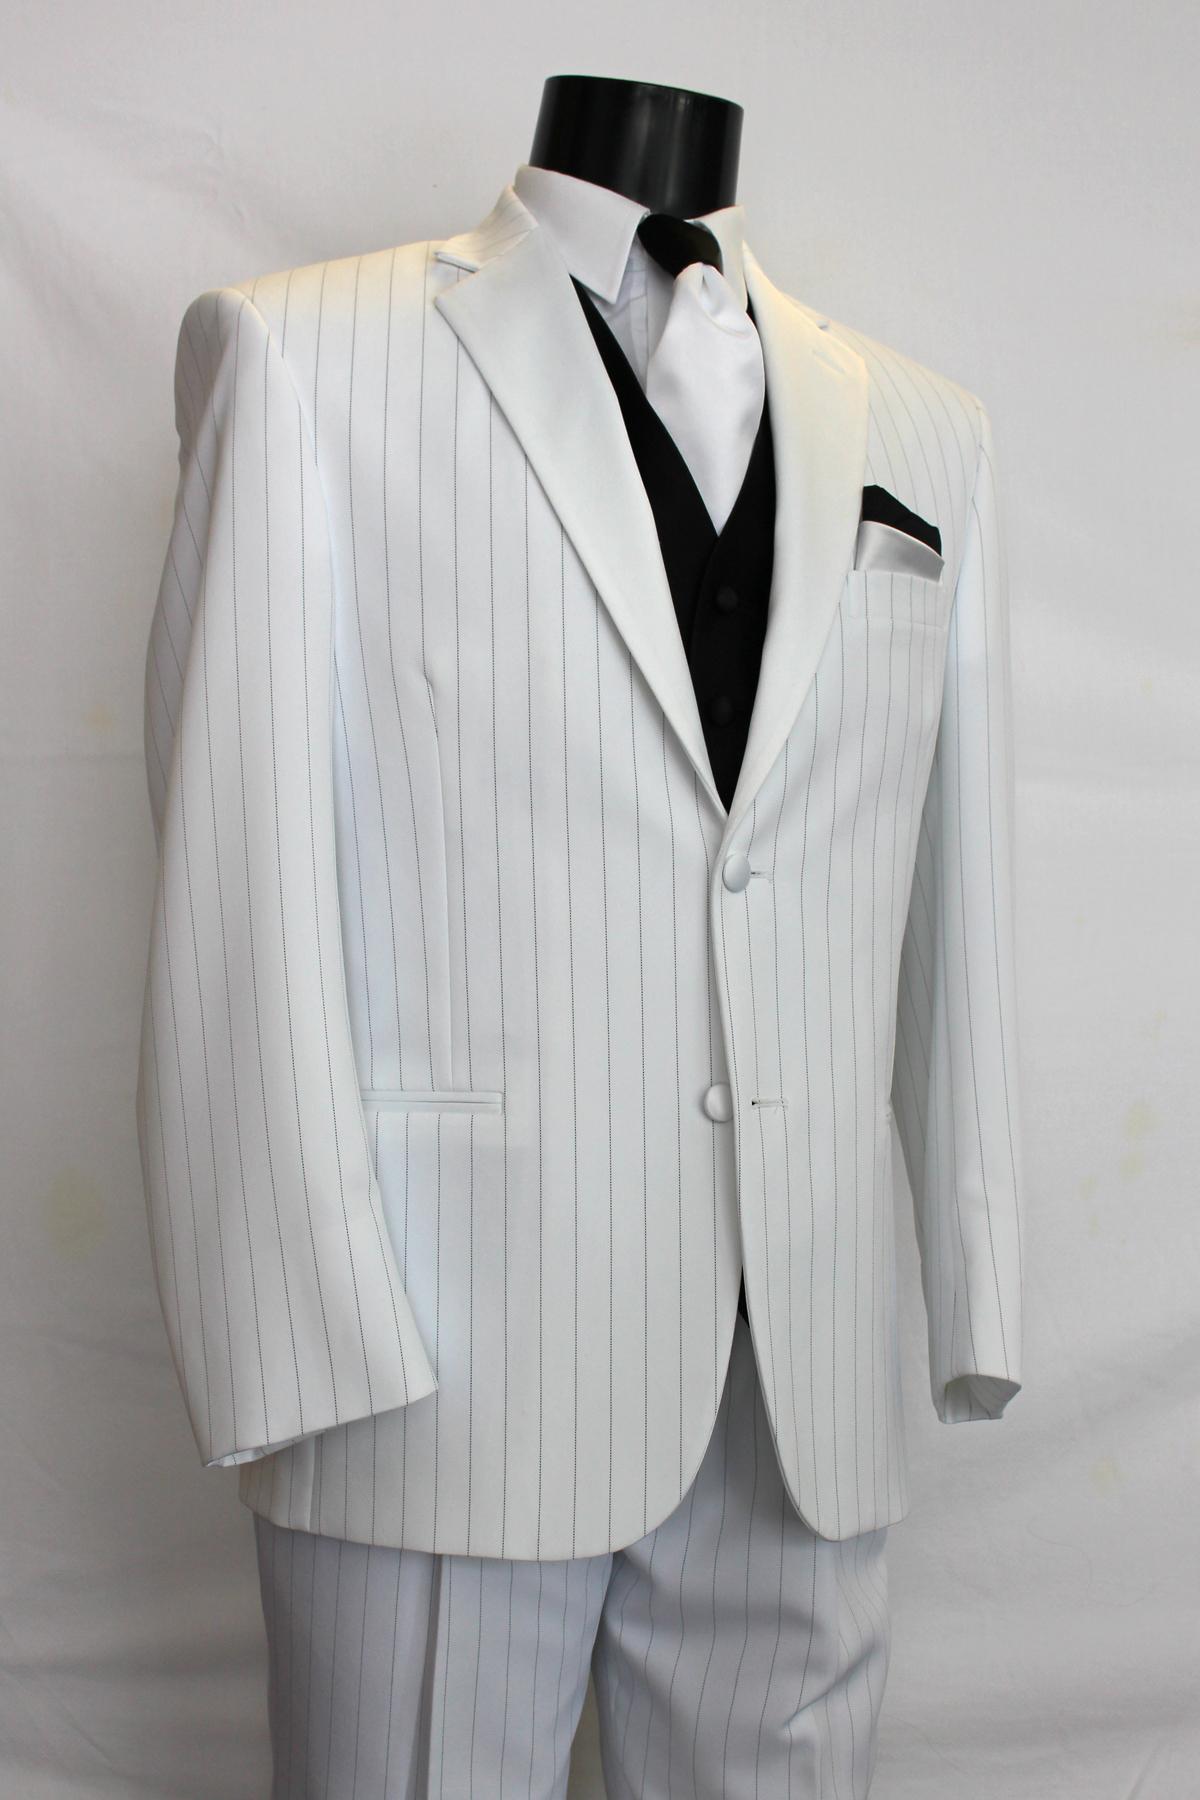 IMG 4874a - Wedding Dress Rental